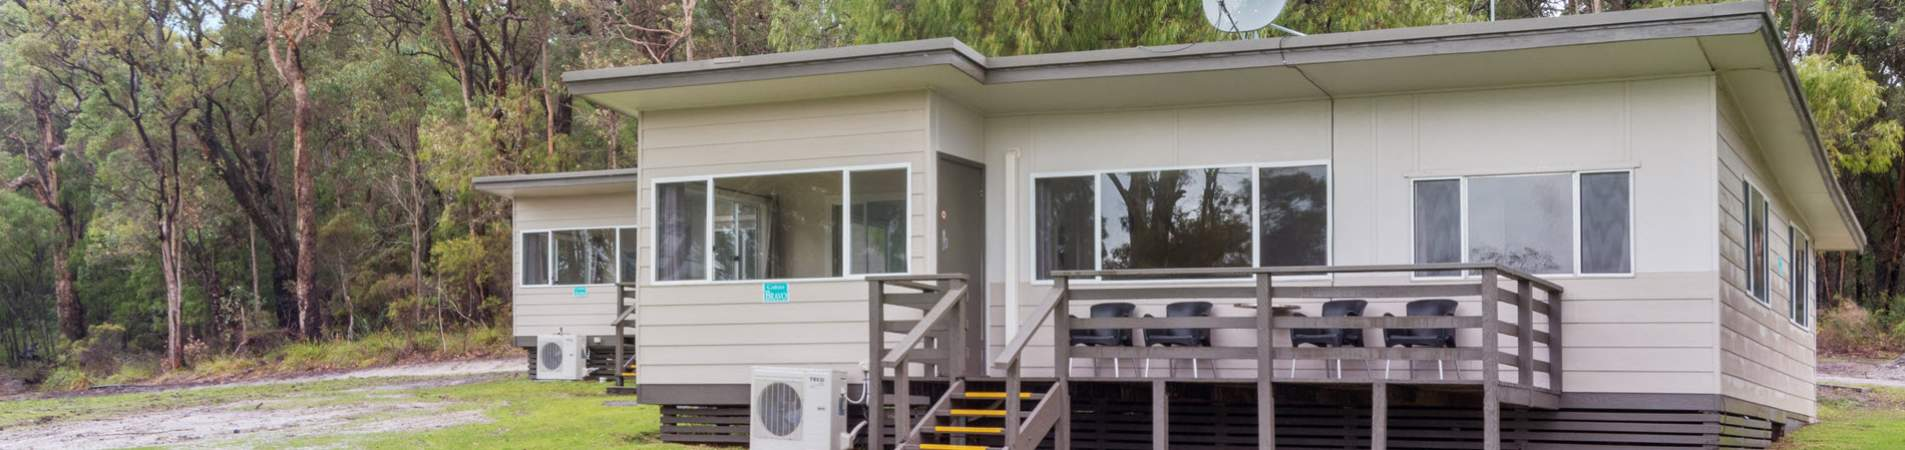 walpole rest point caravan park accommodation - banner 3